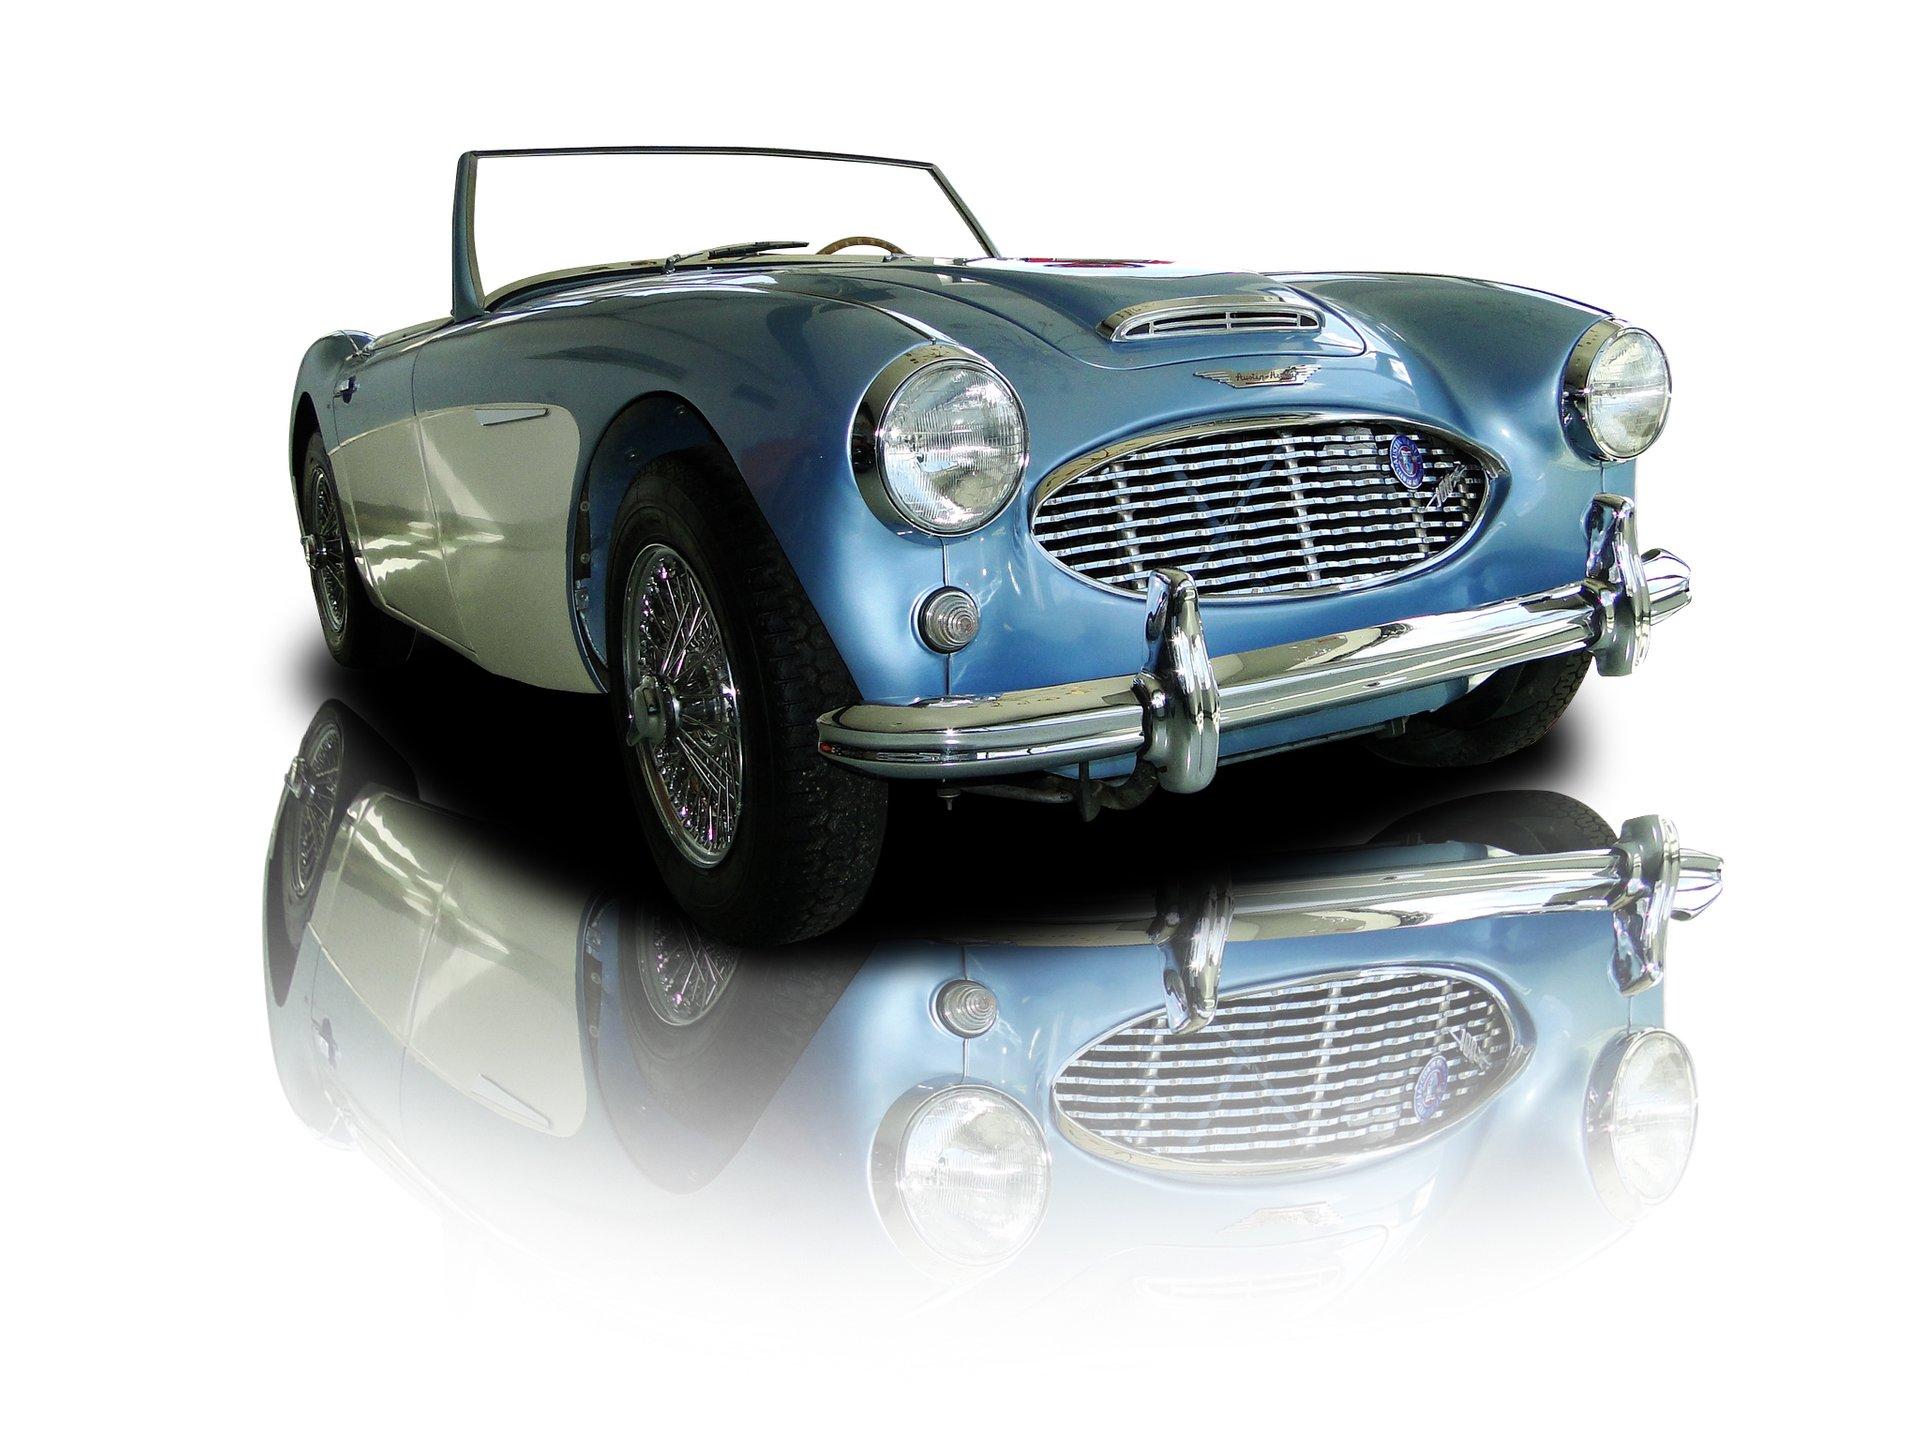 1959 austin healey 100 6 bn6